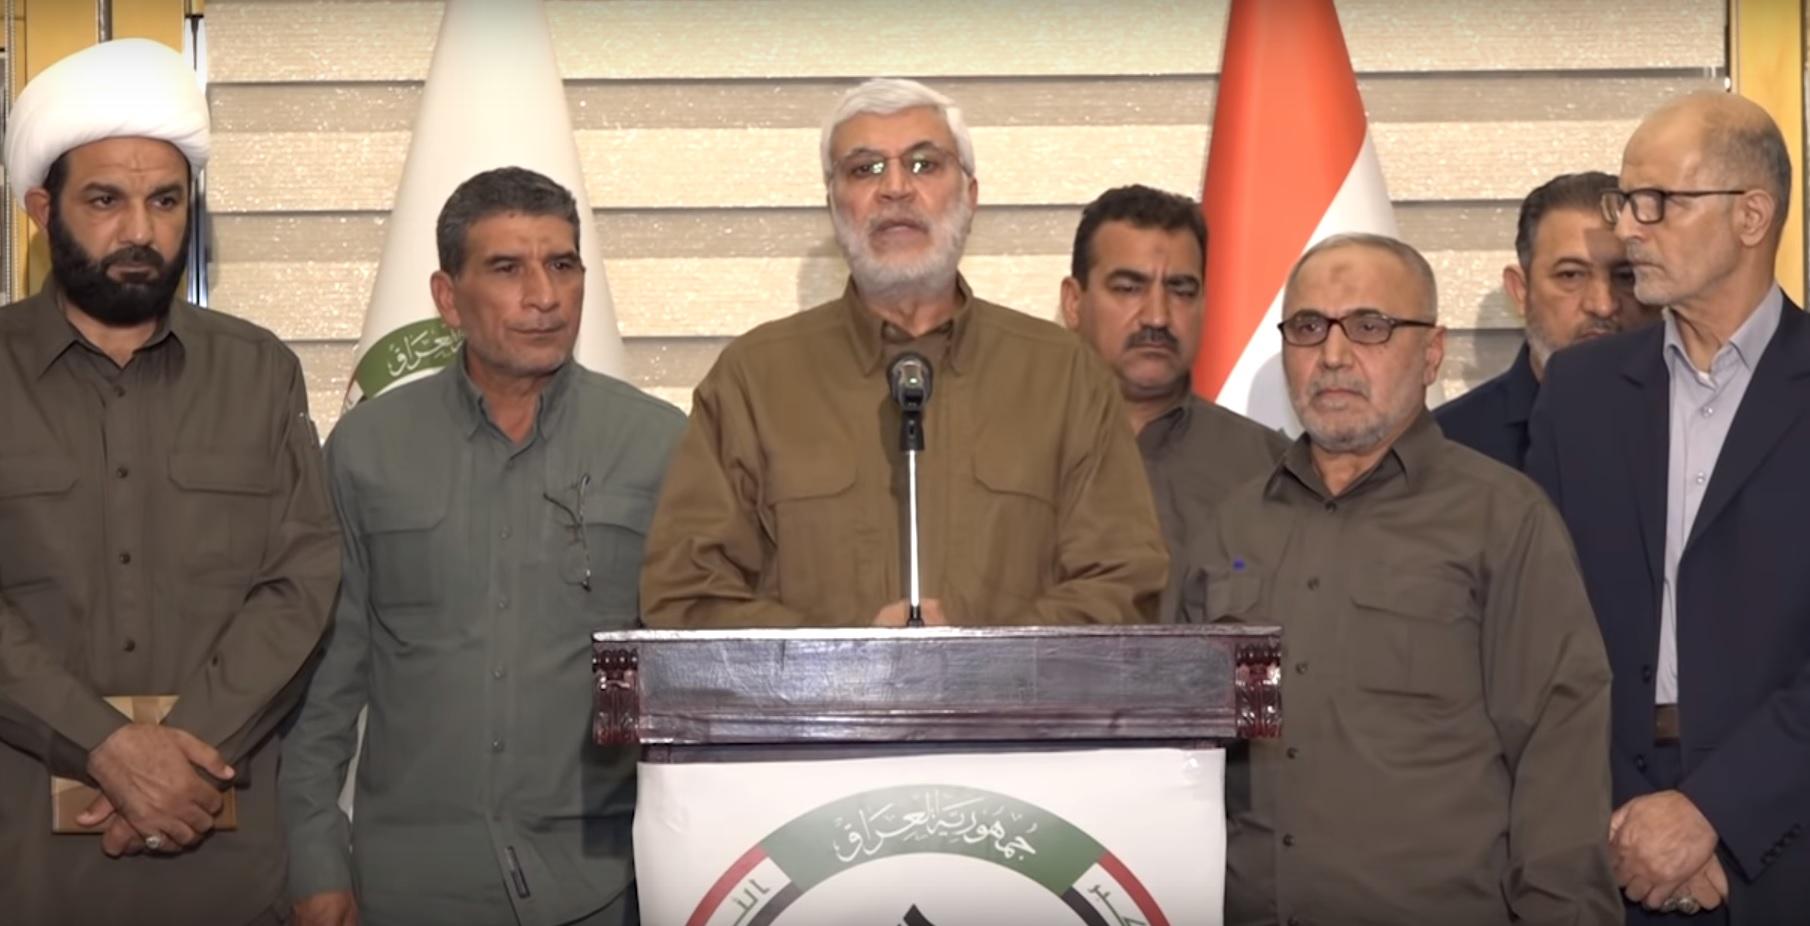 Not Israel: Iraqi PMU Accuses US-led Coalition Of Killing Its Fighters Near Al-Bukamal